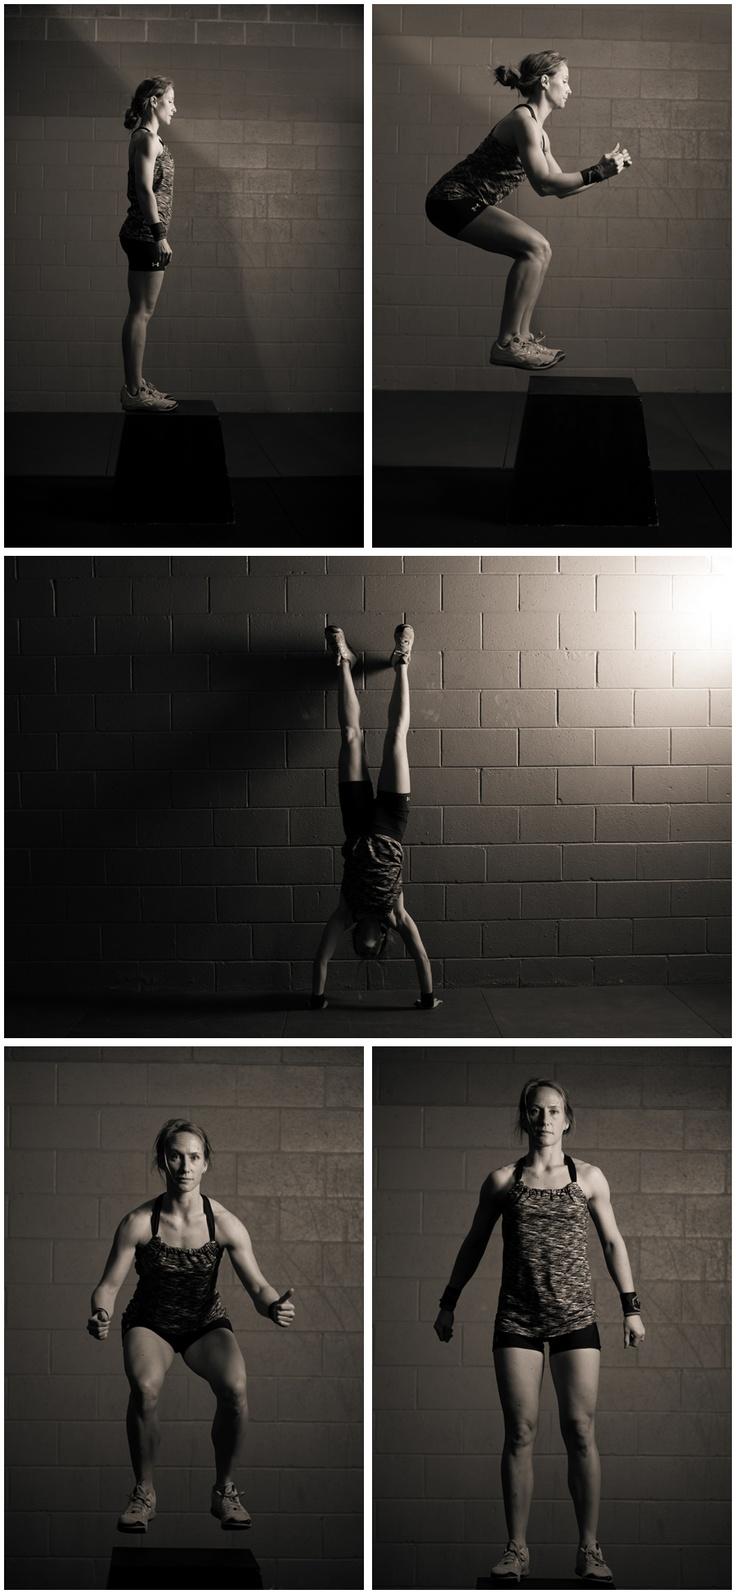 Crossfit Gym Photography Crossfit Gym Photograp...